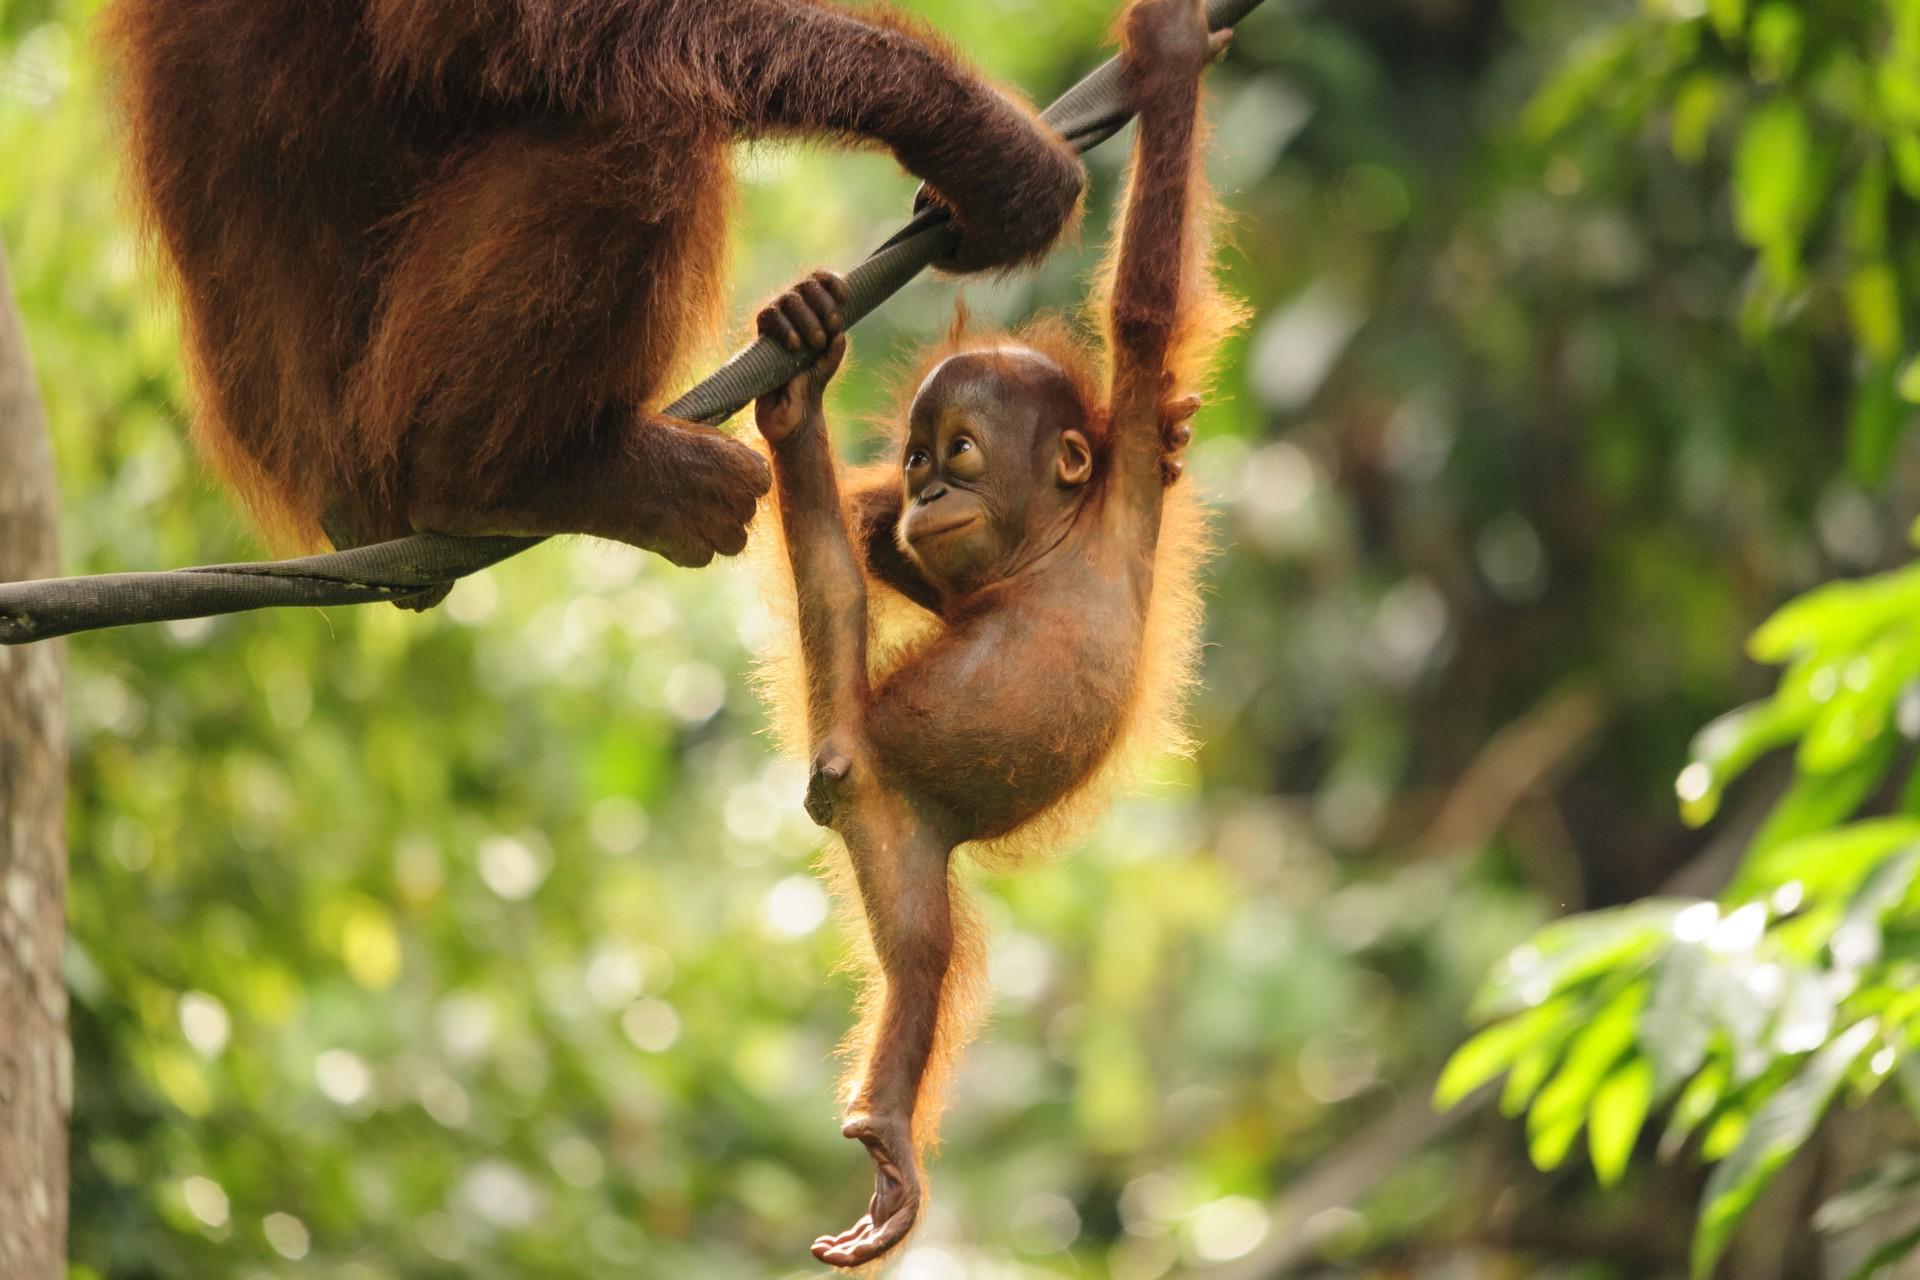 Baby orangutan playing in Borneo